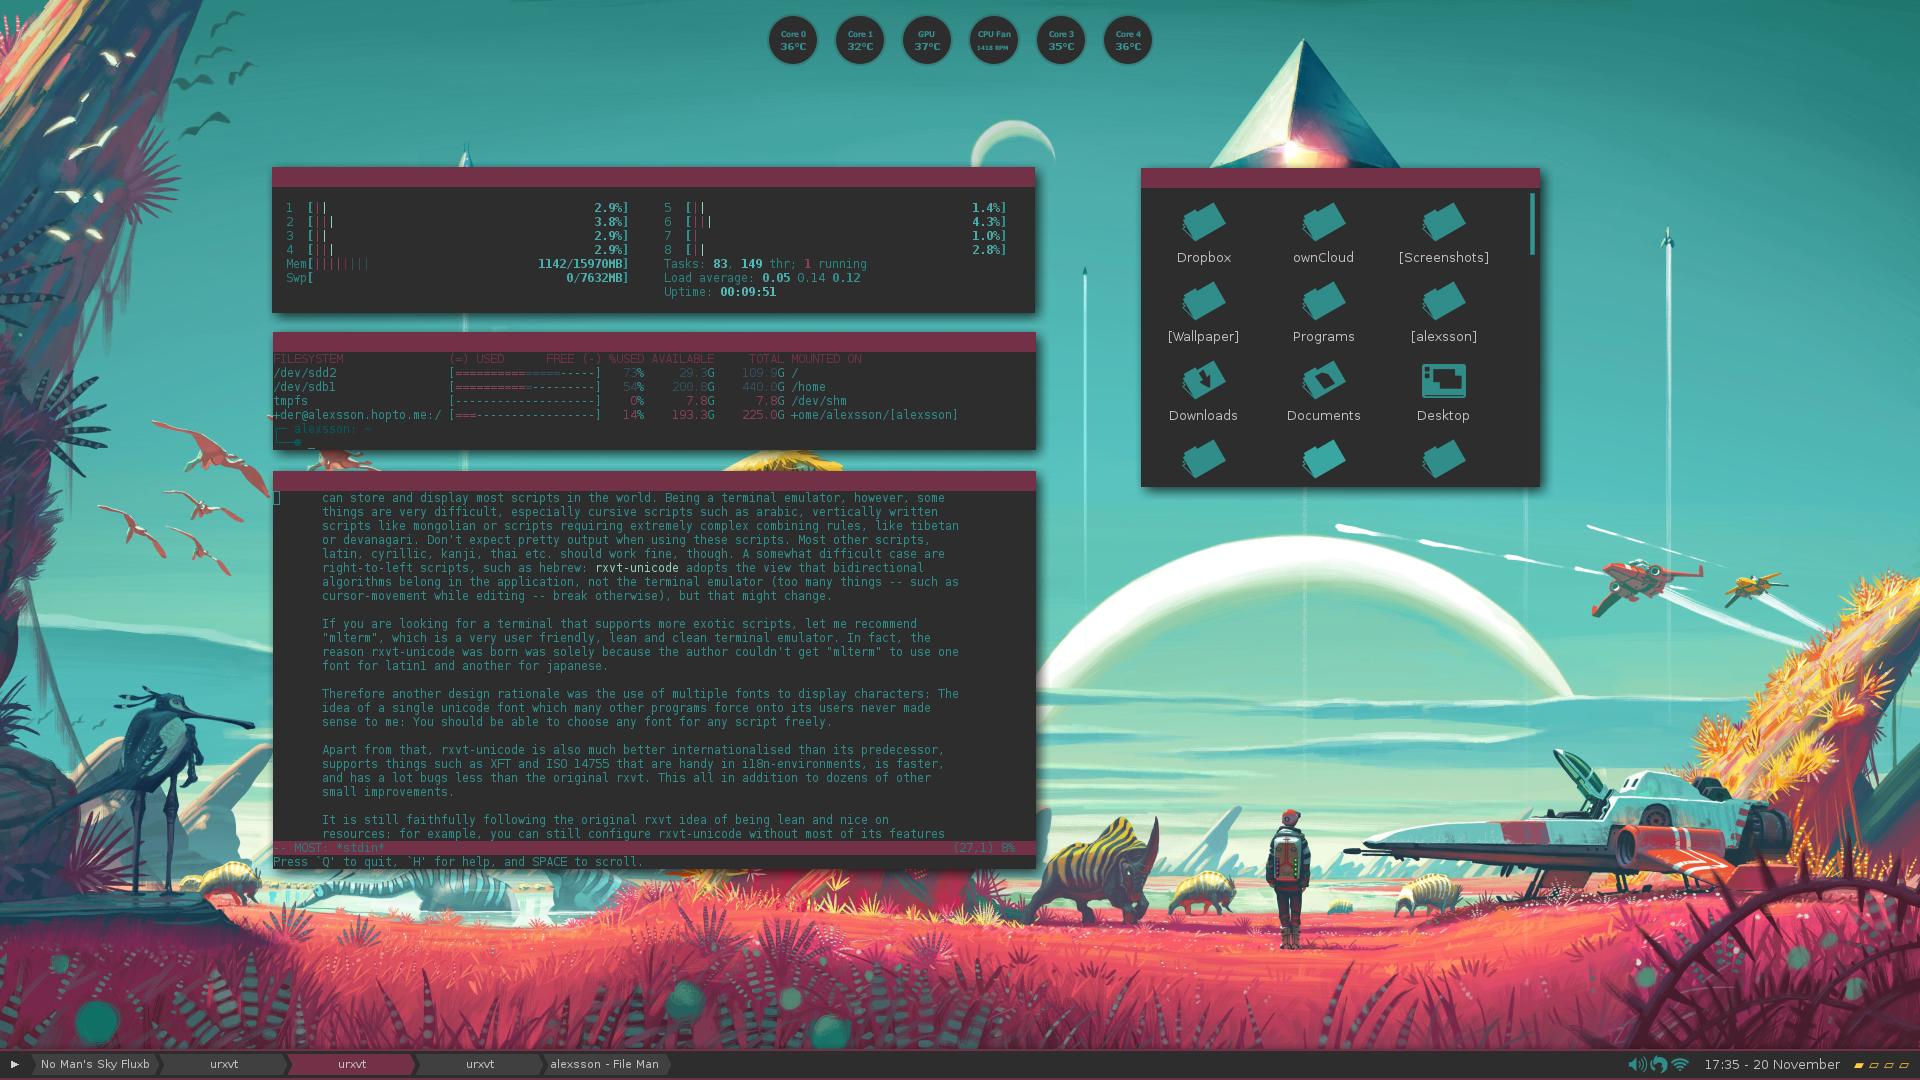 Fluxbox screenshot based on No Mans Sky OS ThemesCustomization 1920x1080